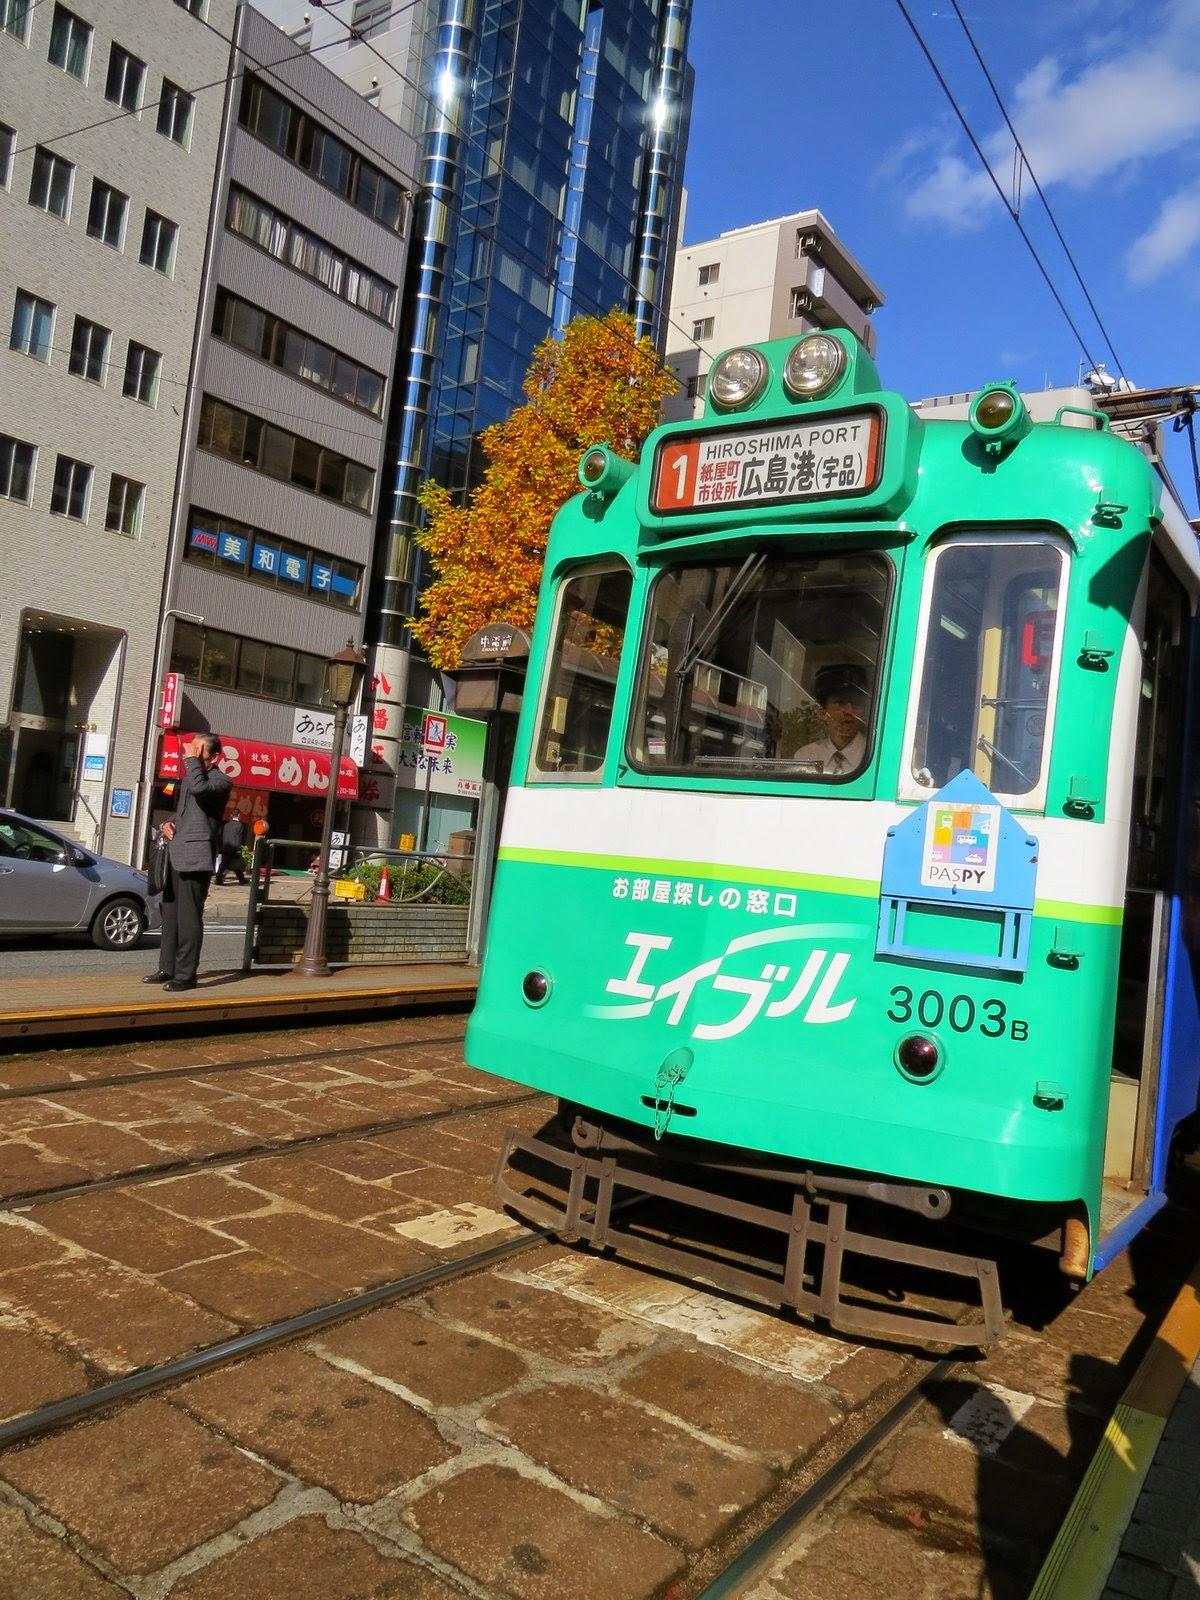 Hiroshima Street Car